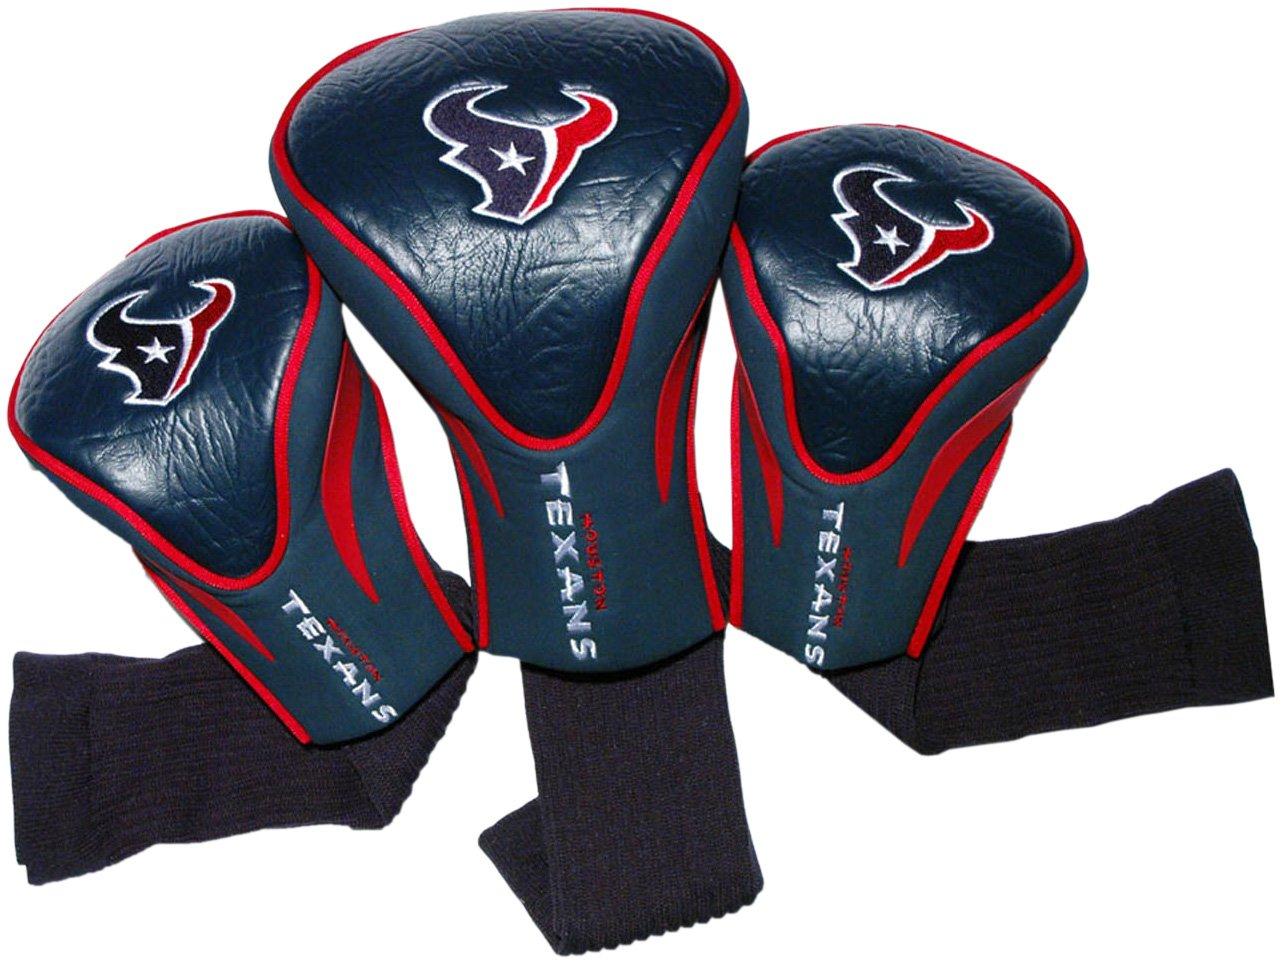 Team Golf NFL Houston Texans Contour Golf Club